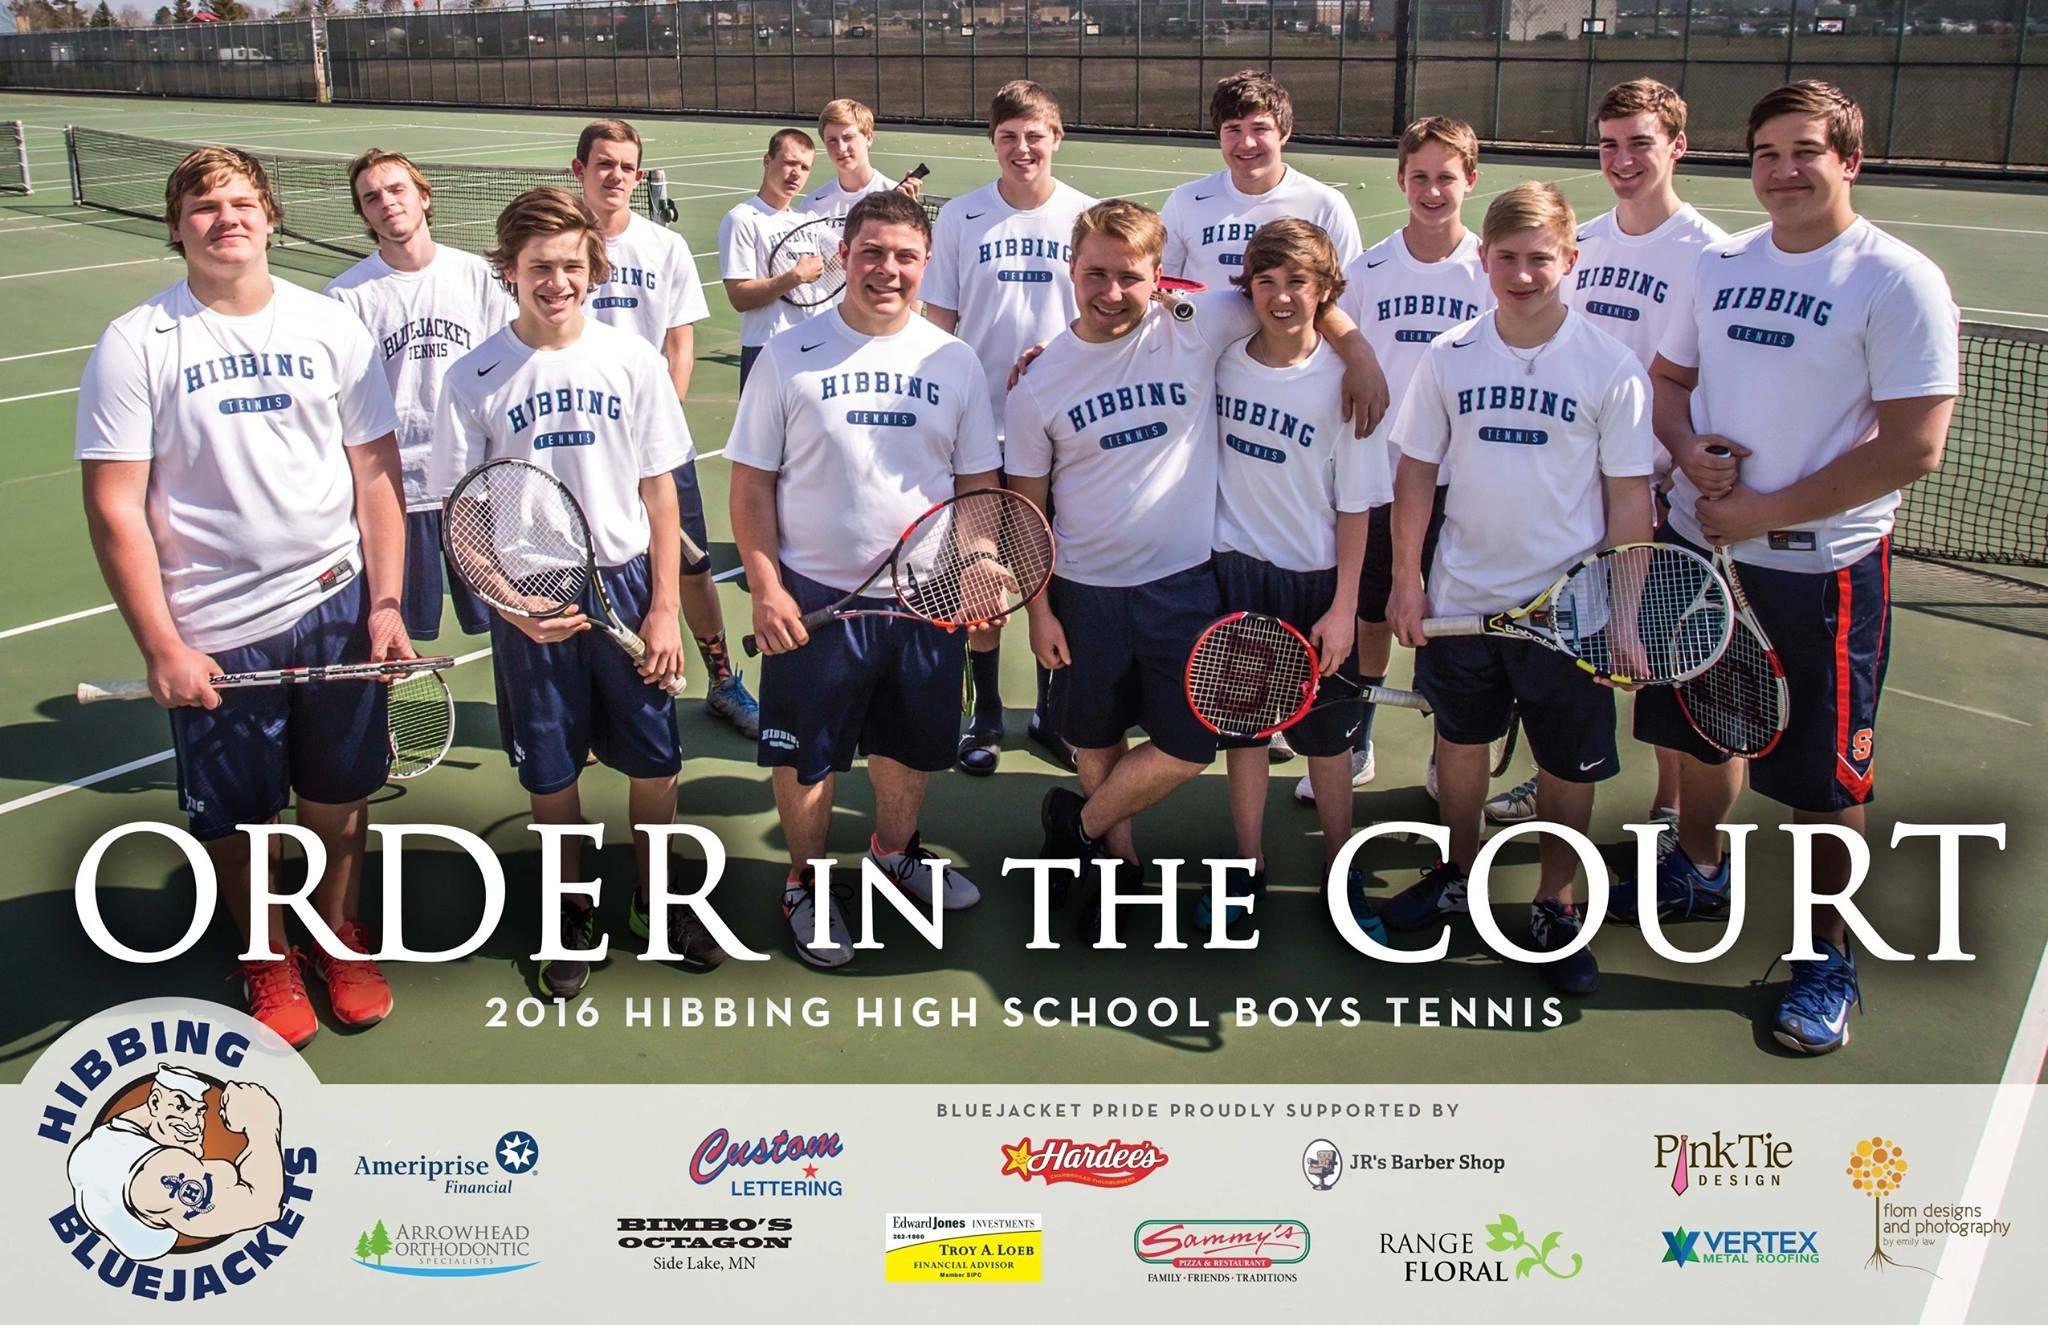 Tennis Team Poster Tennis Hibbing Poster Team Poster Ideas Tennis Team School Boy